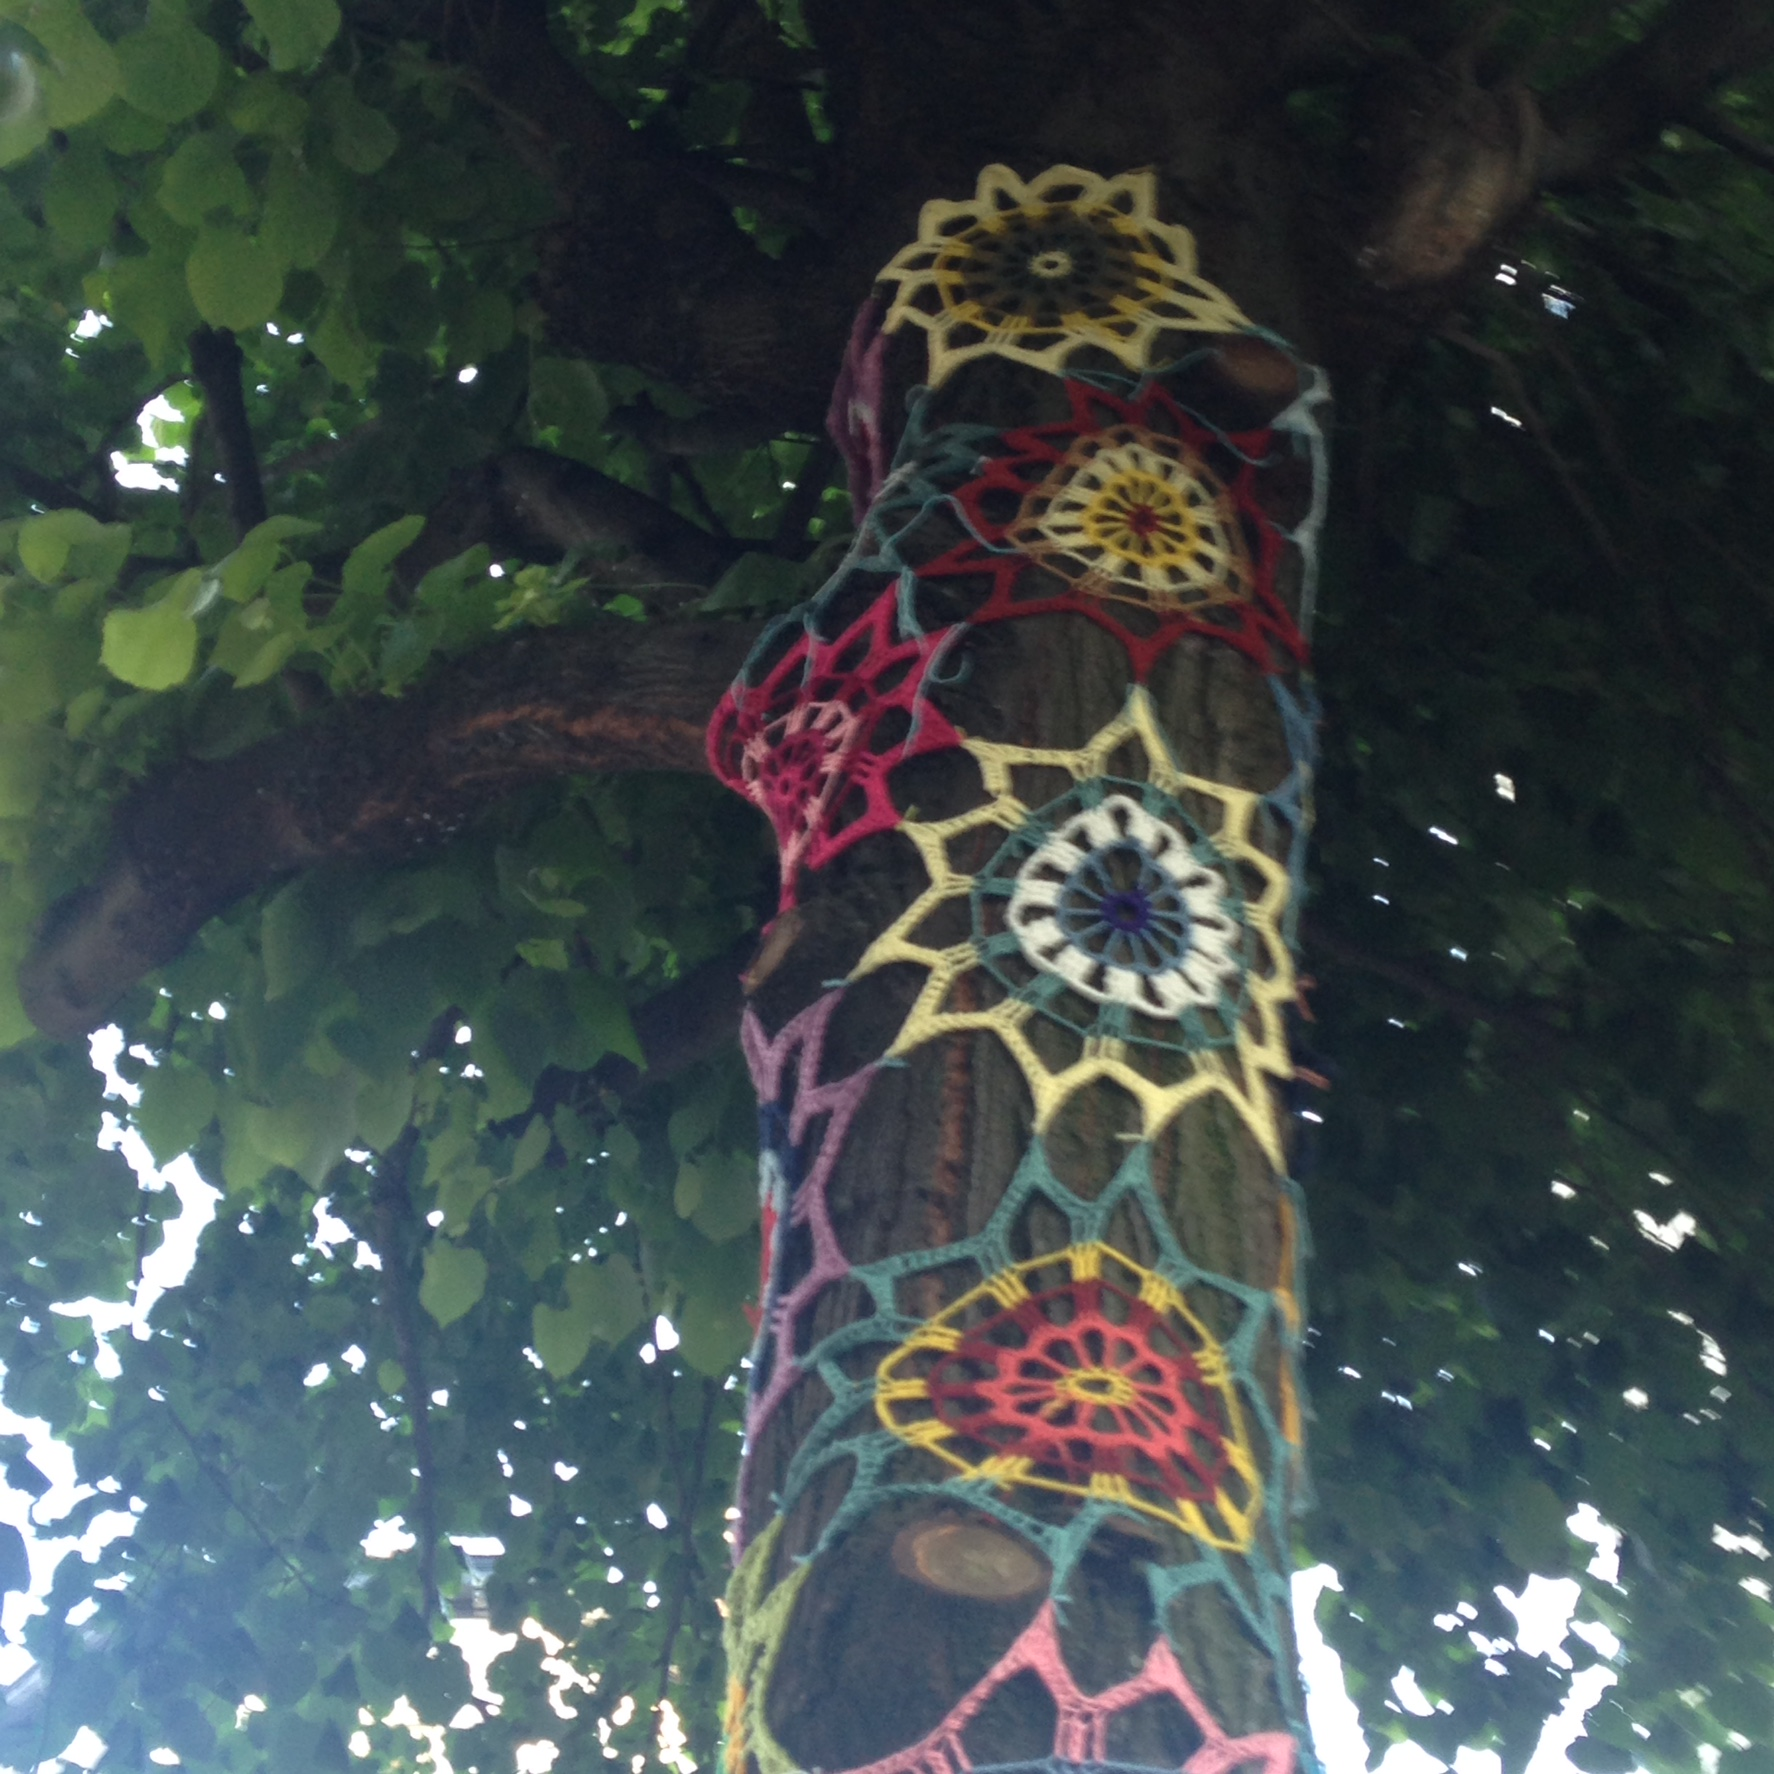 Ch d'Ixelles yarn bomb flowers close-up.JPG